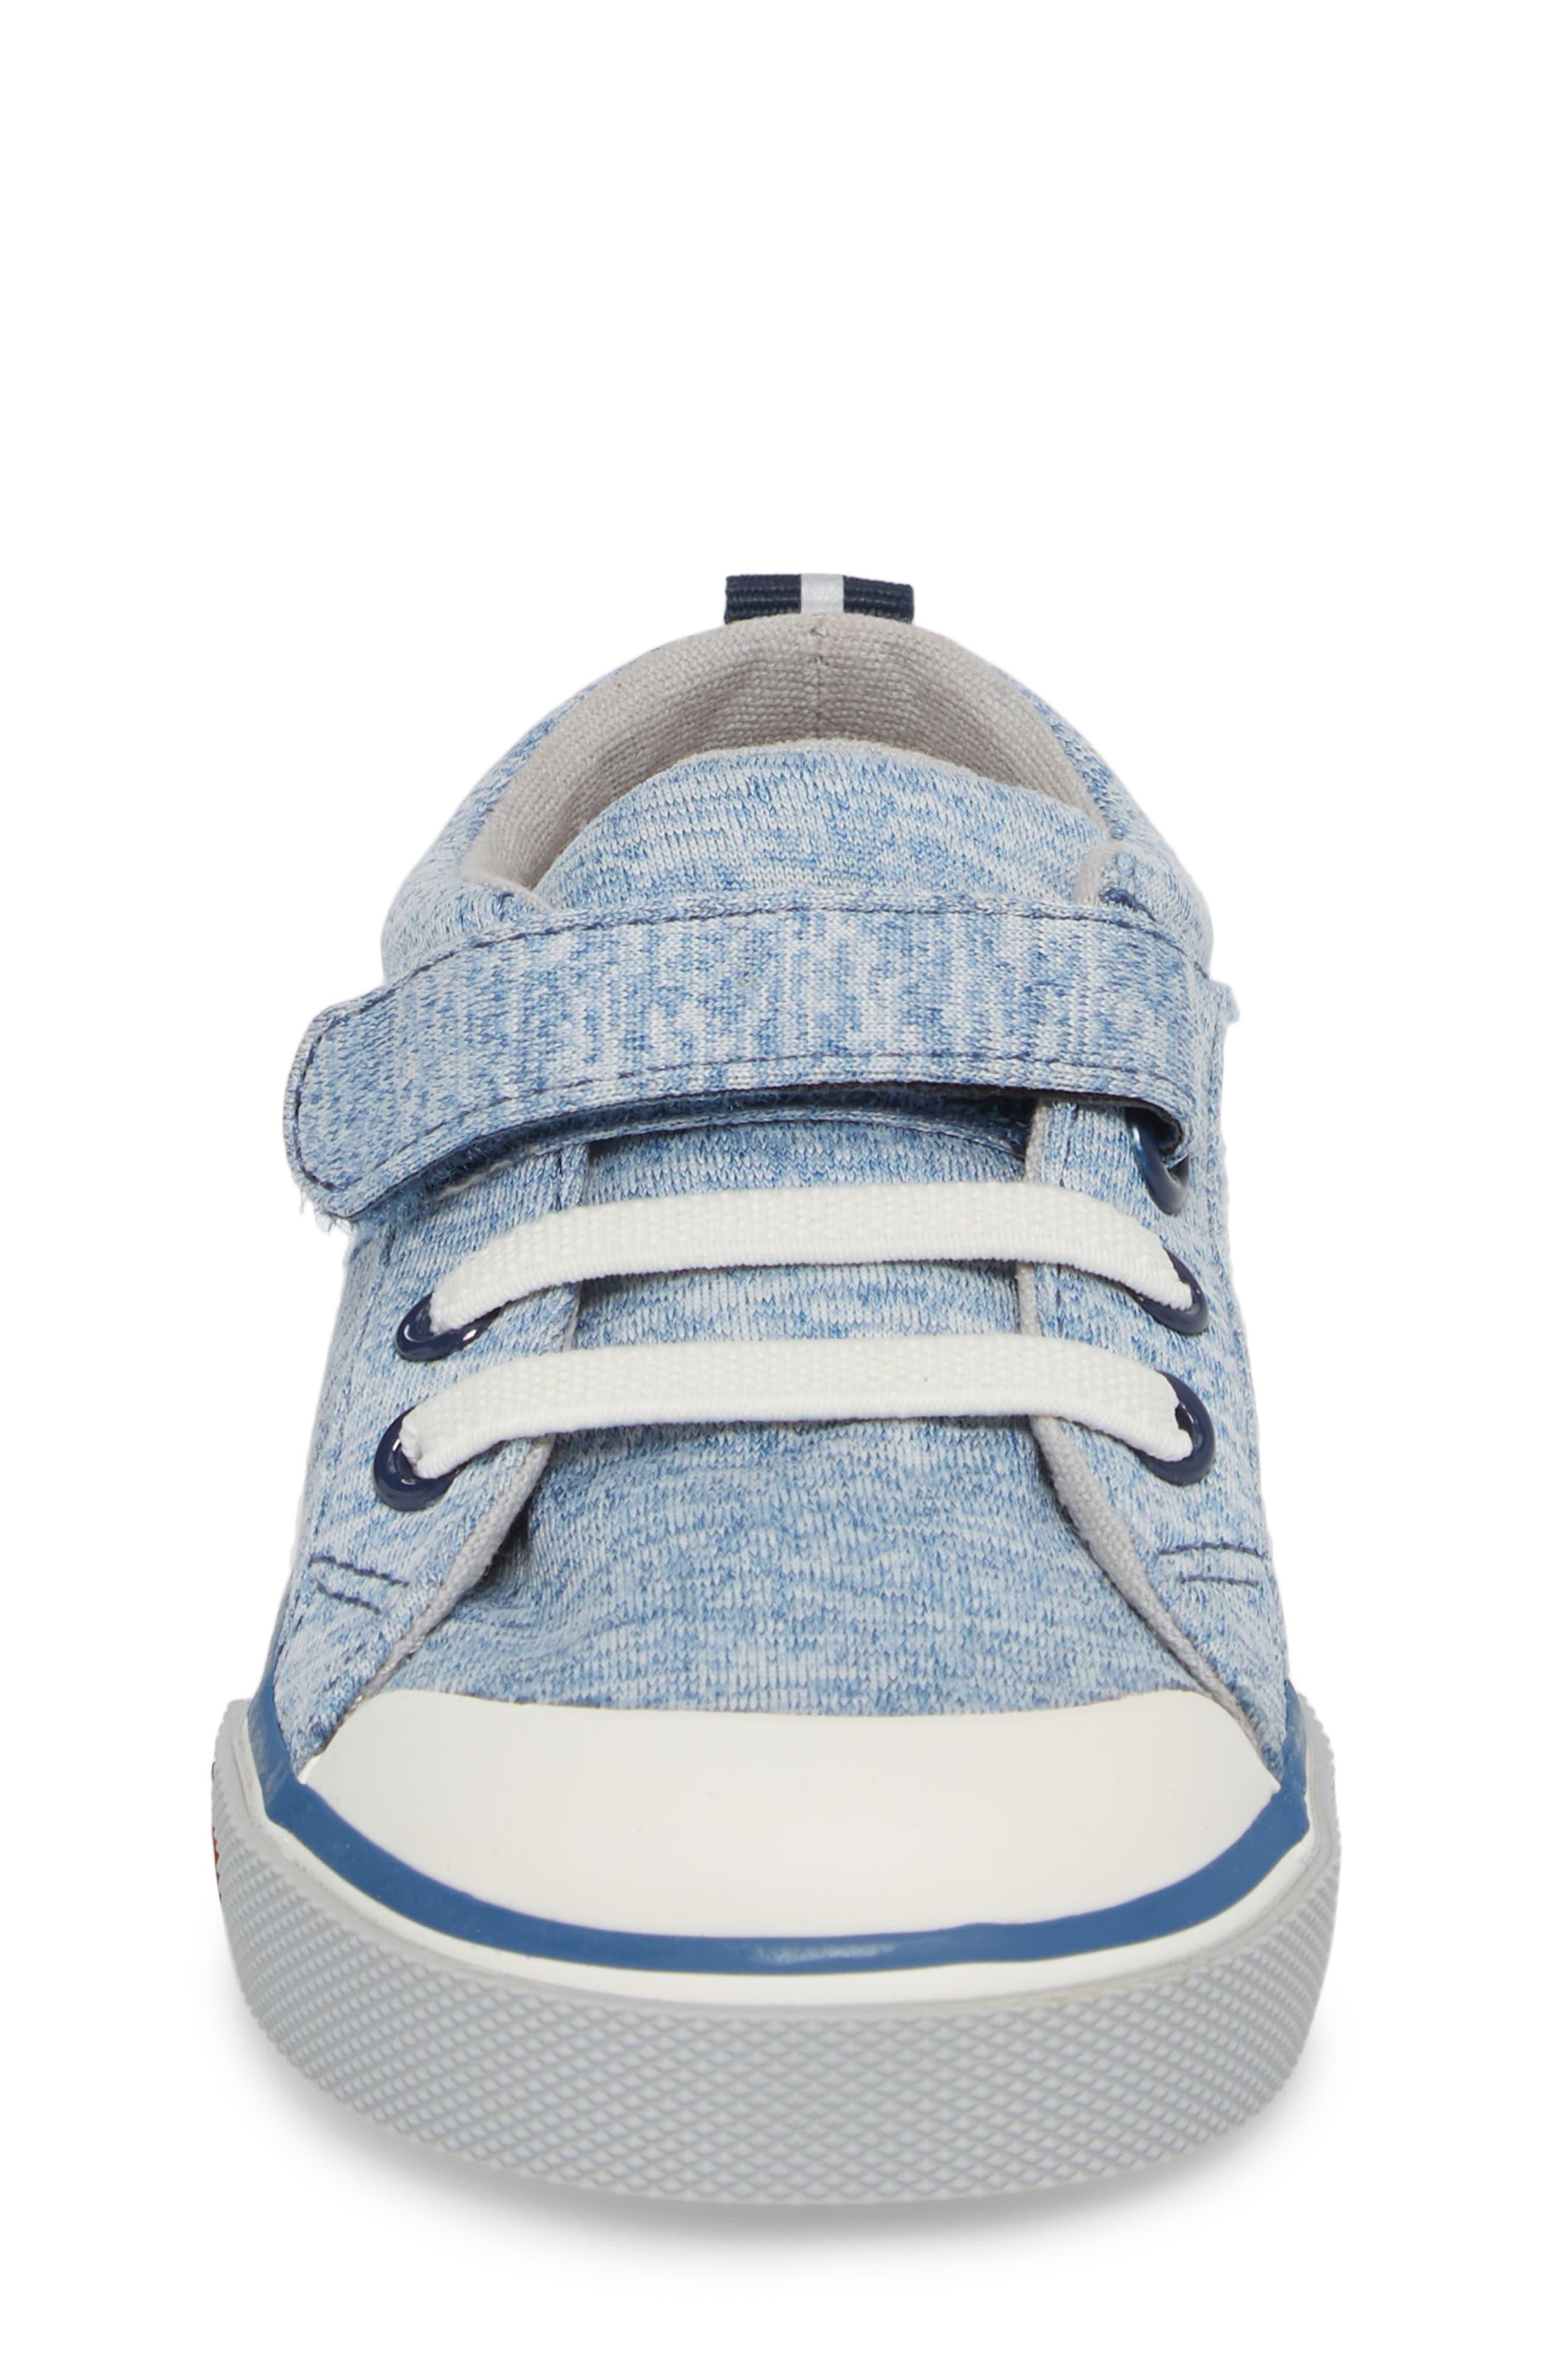 Tanner Sneaker,                             Alternate thumbnail 4, color,                             Blue Jersey